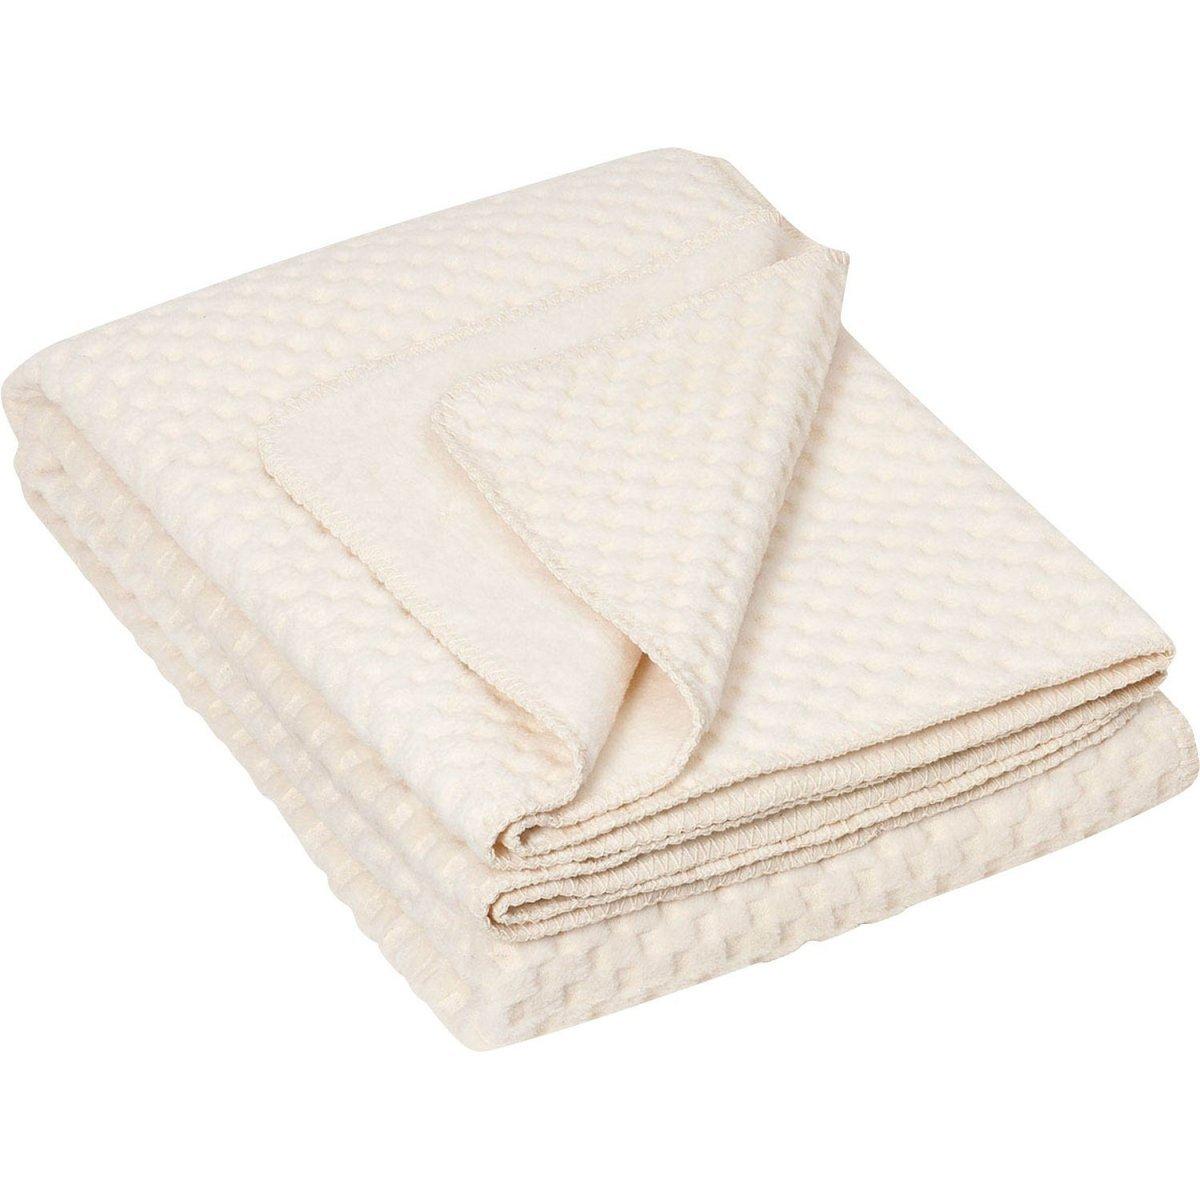 Blanket Jopea in natural organic cotton fleece 150x200